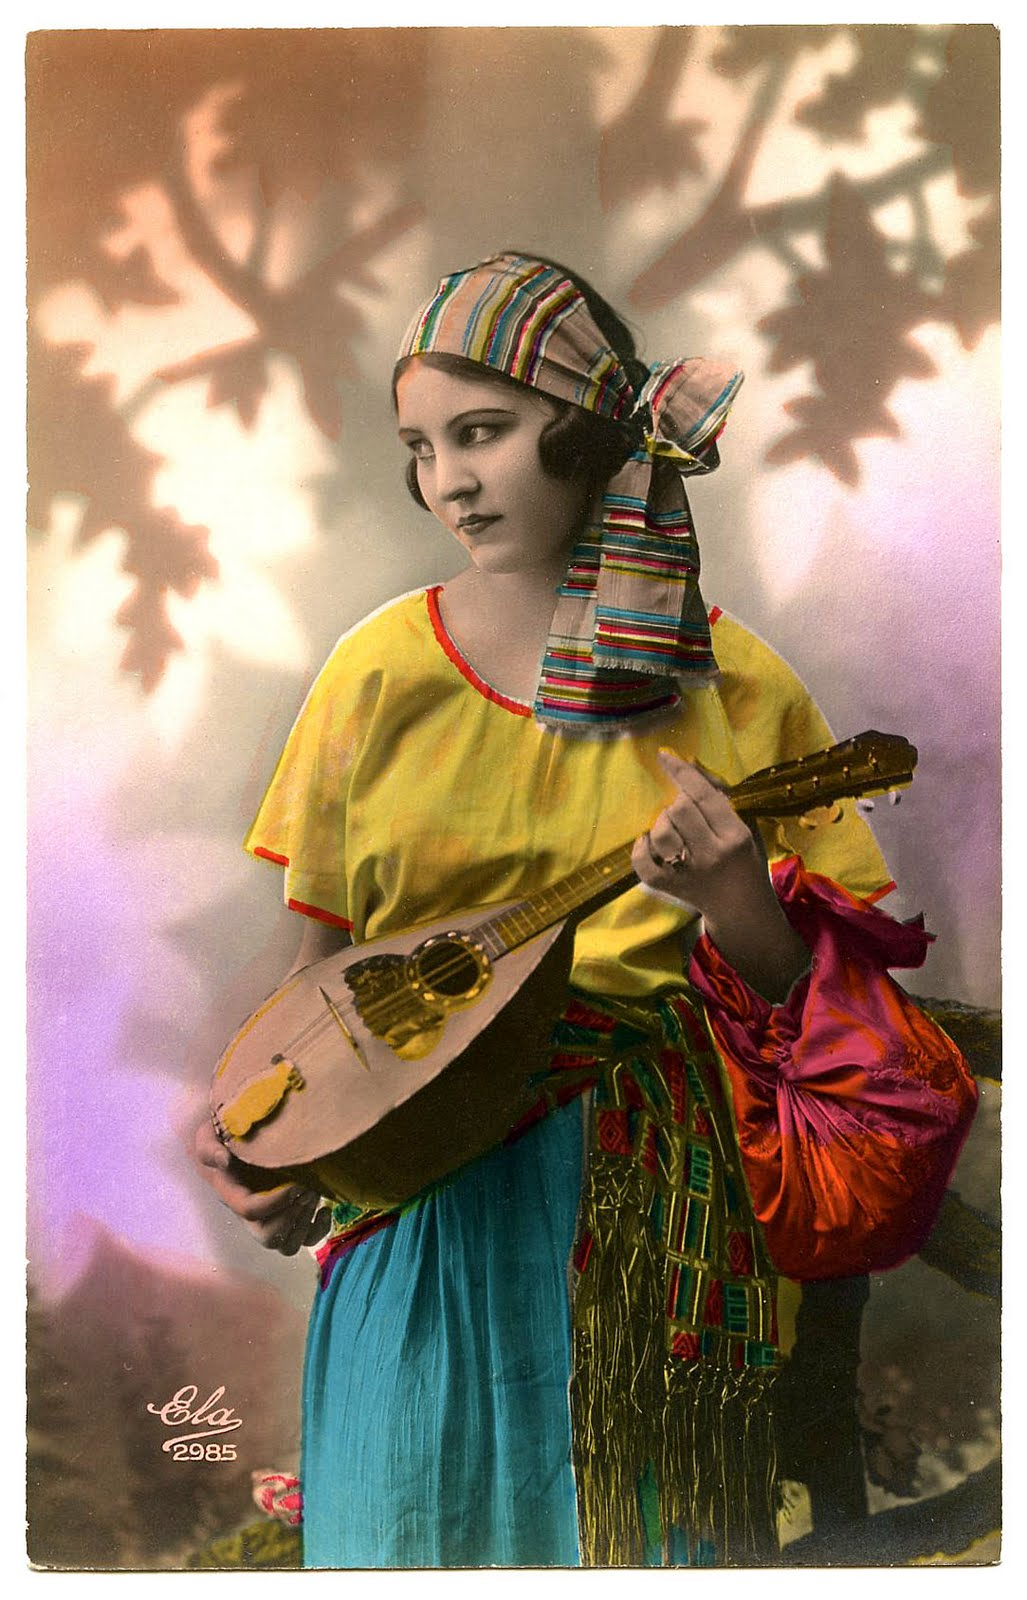 Vintage Image - Fabulous Gypsy